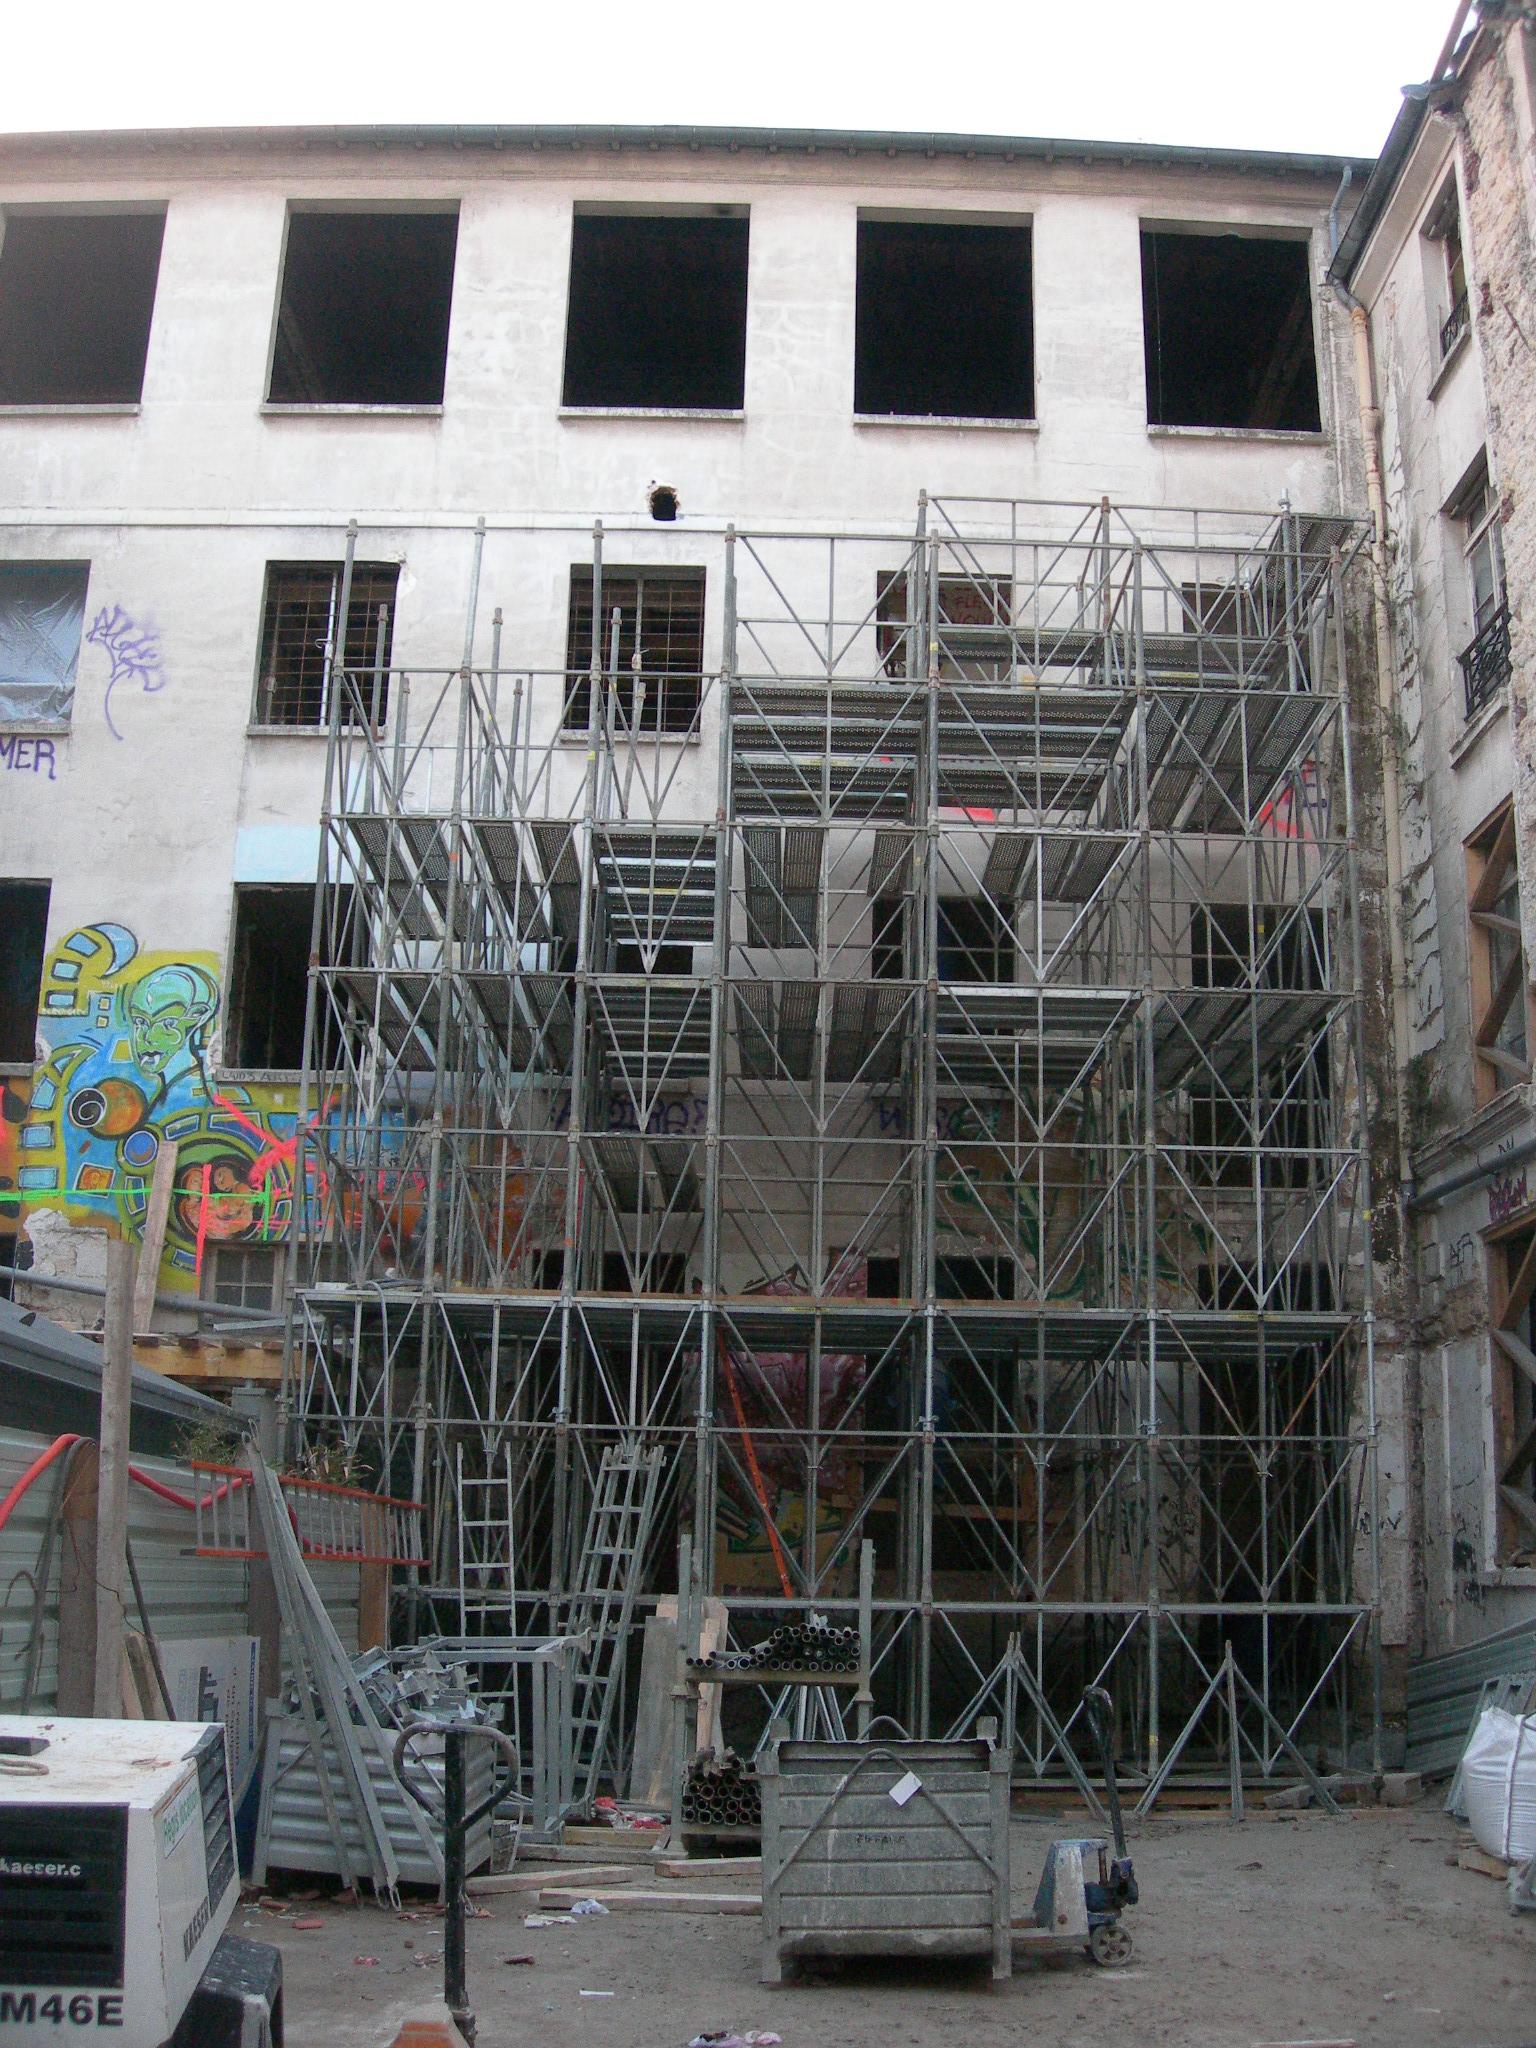 2009 03 11